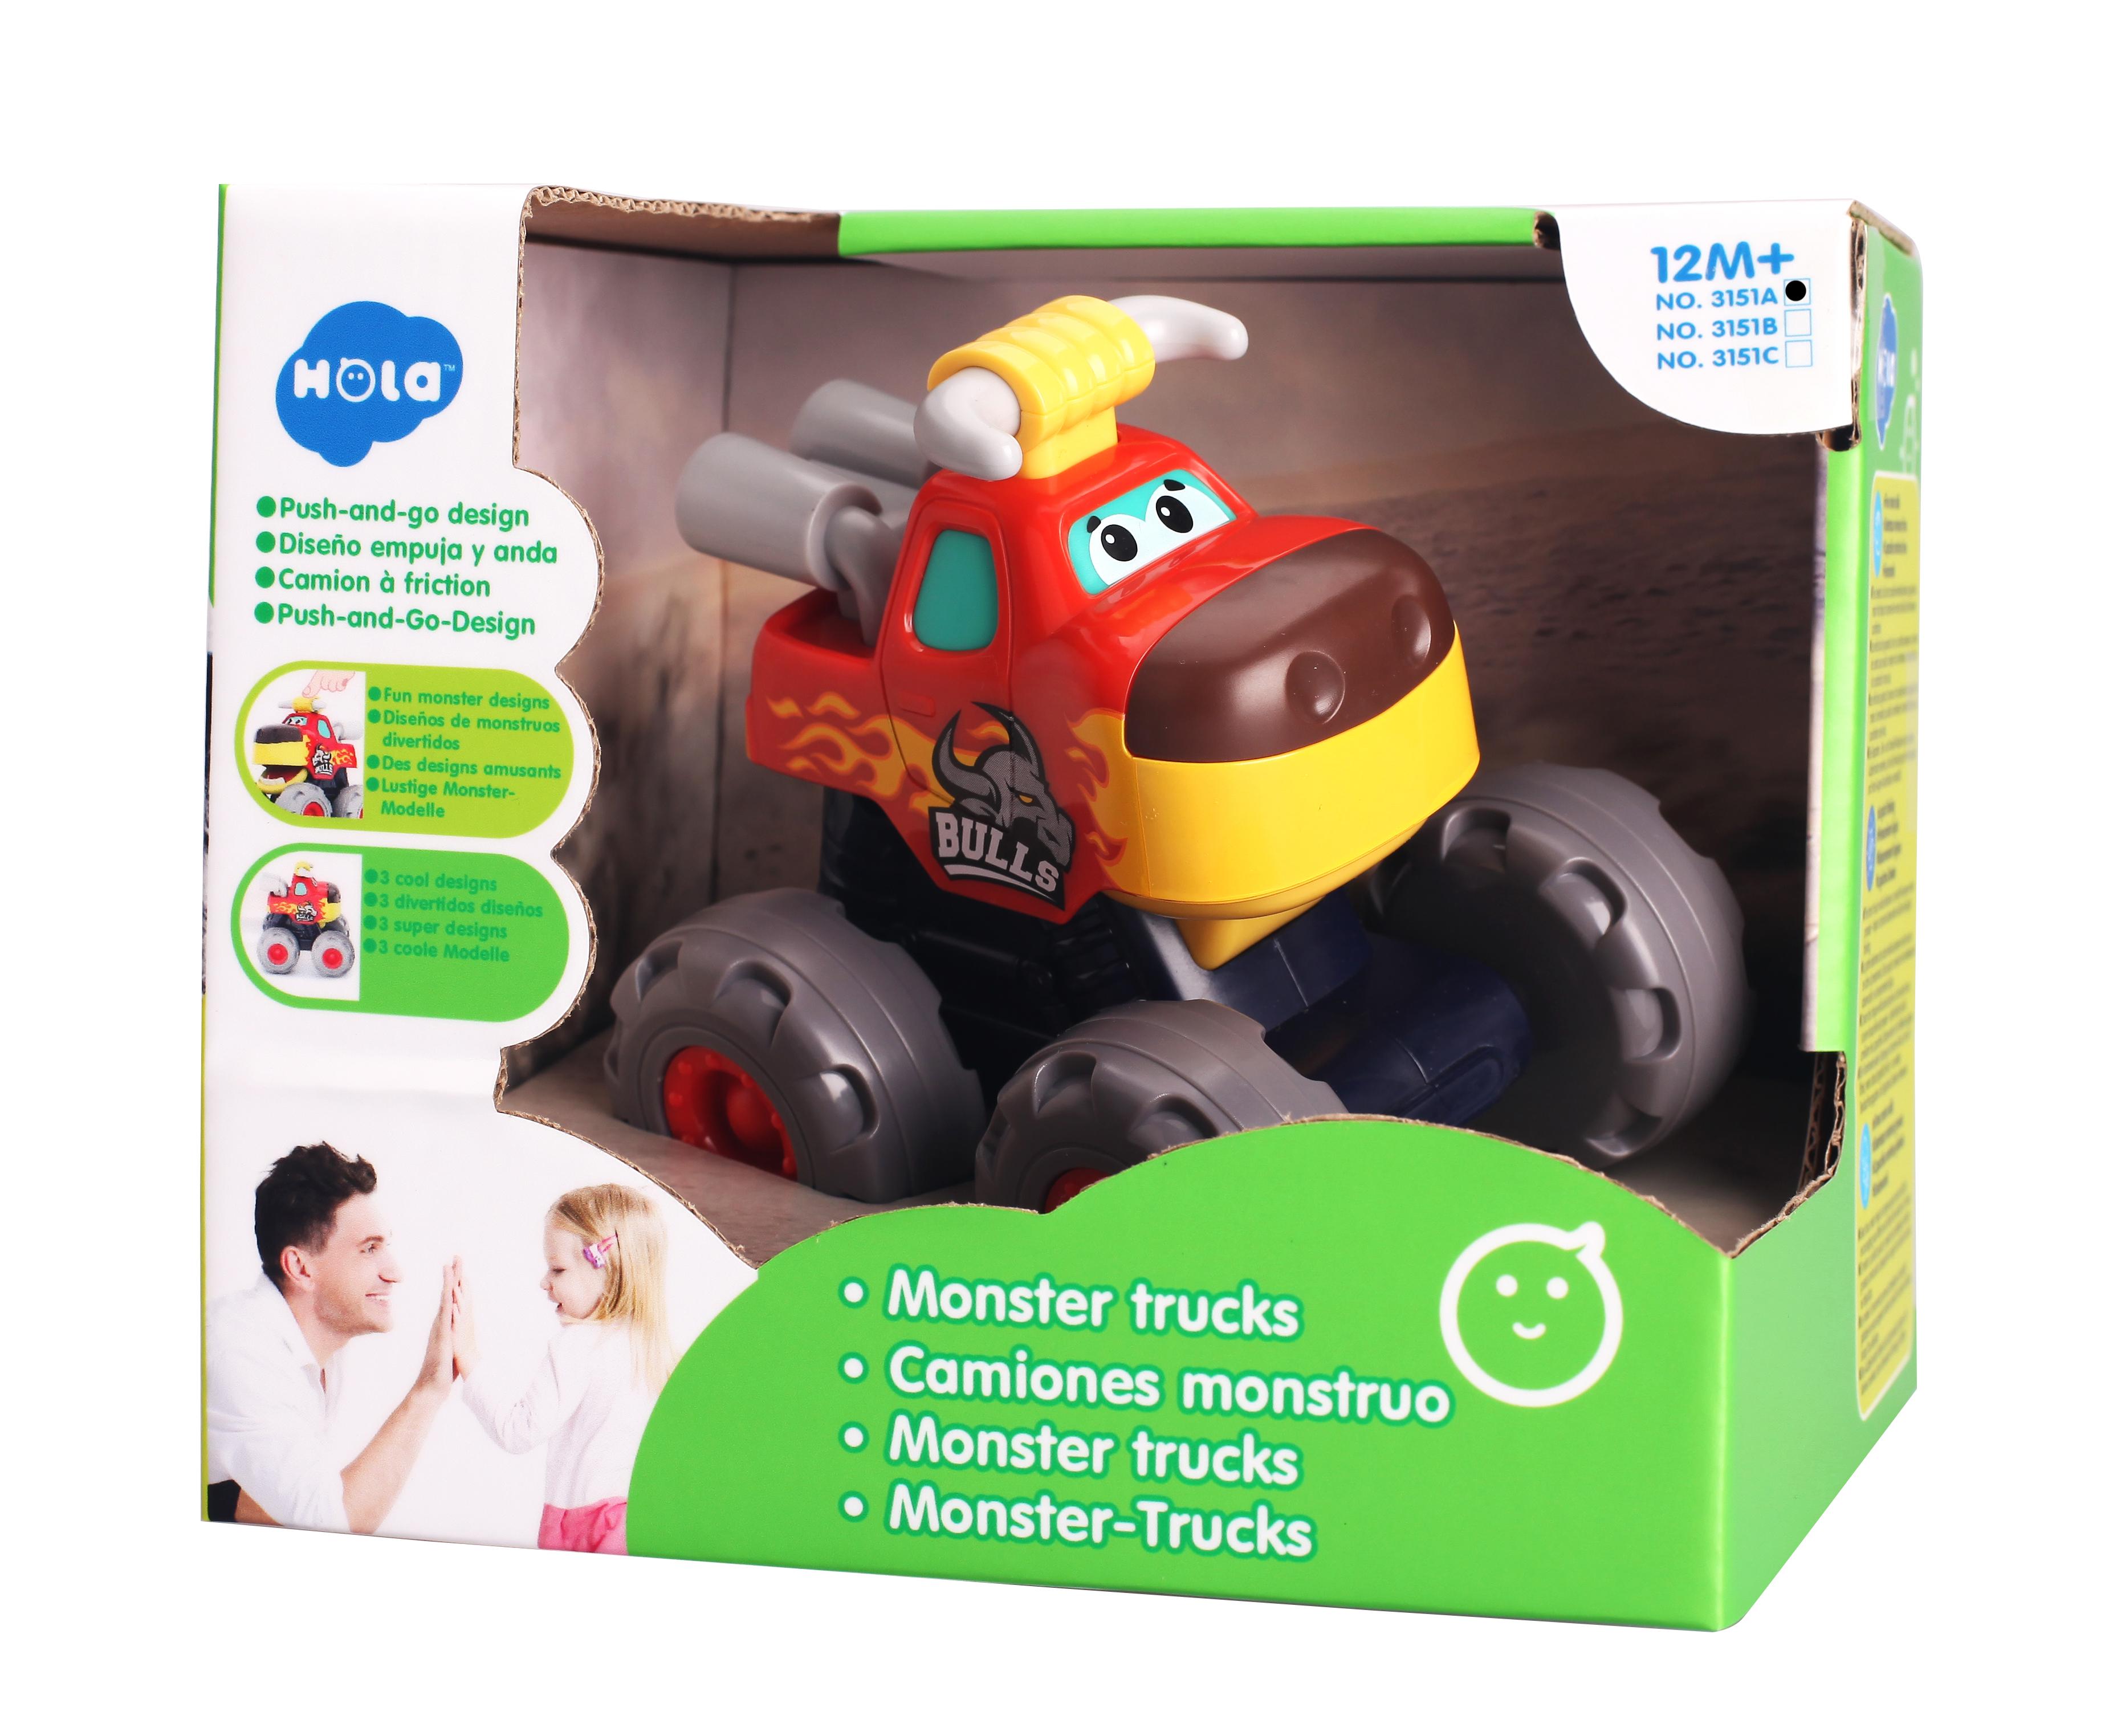 Masinuta Bebe Monster Truck, Taurasul cel Furios   Hola